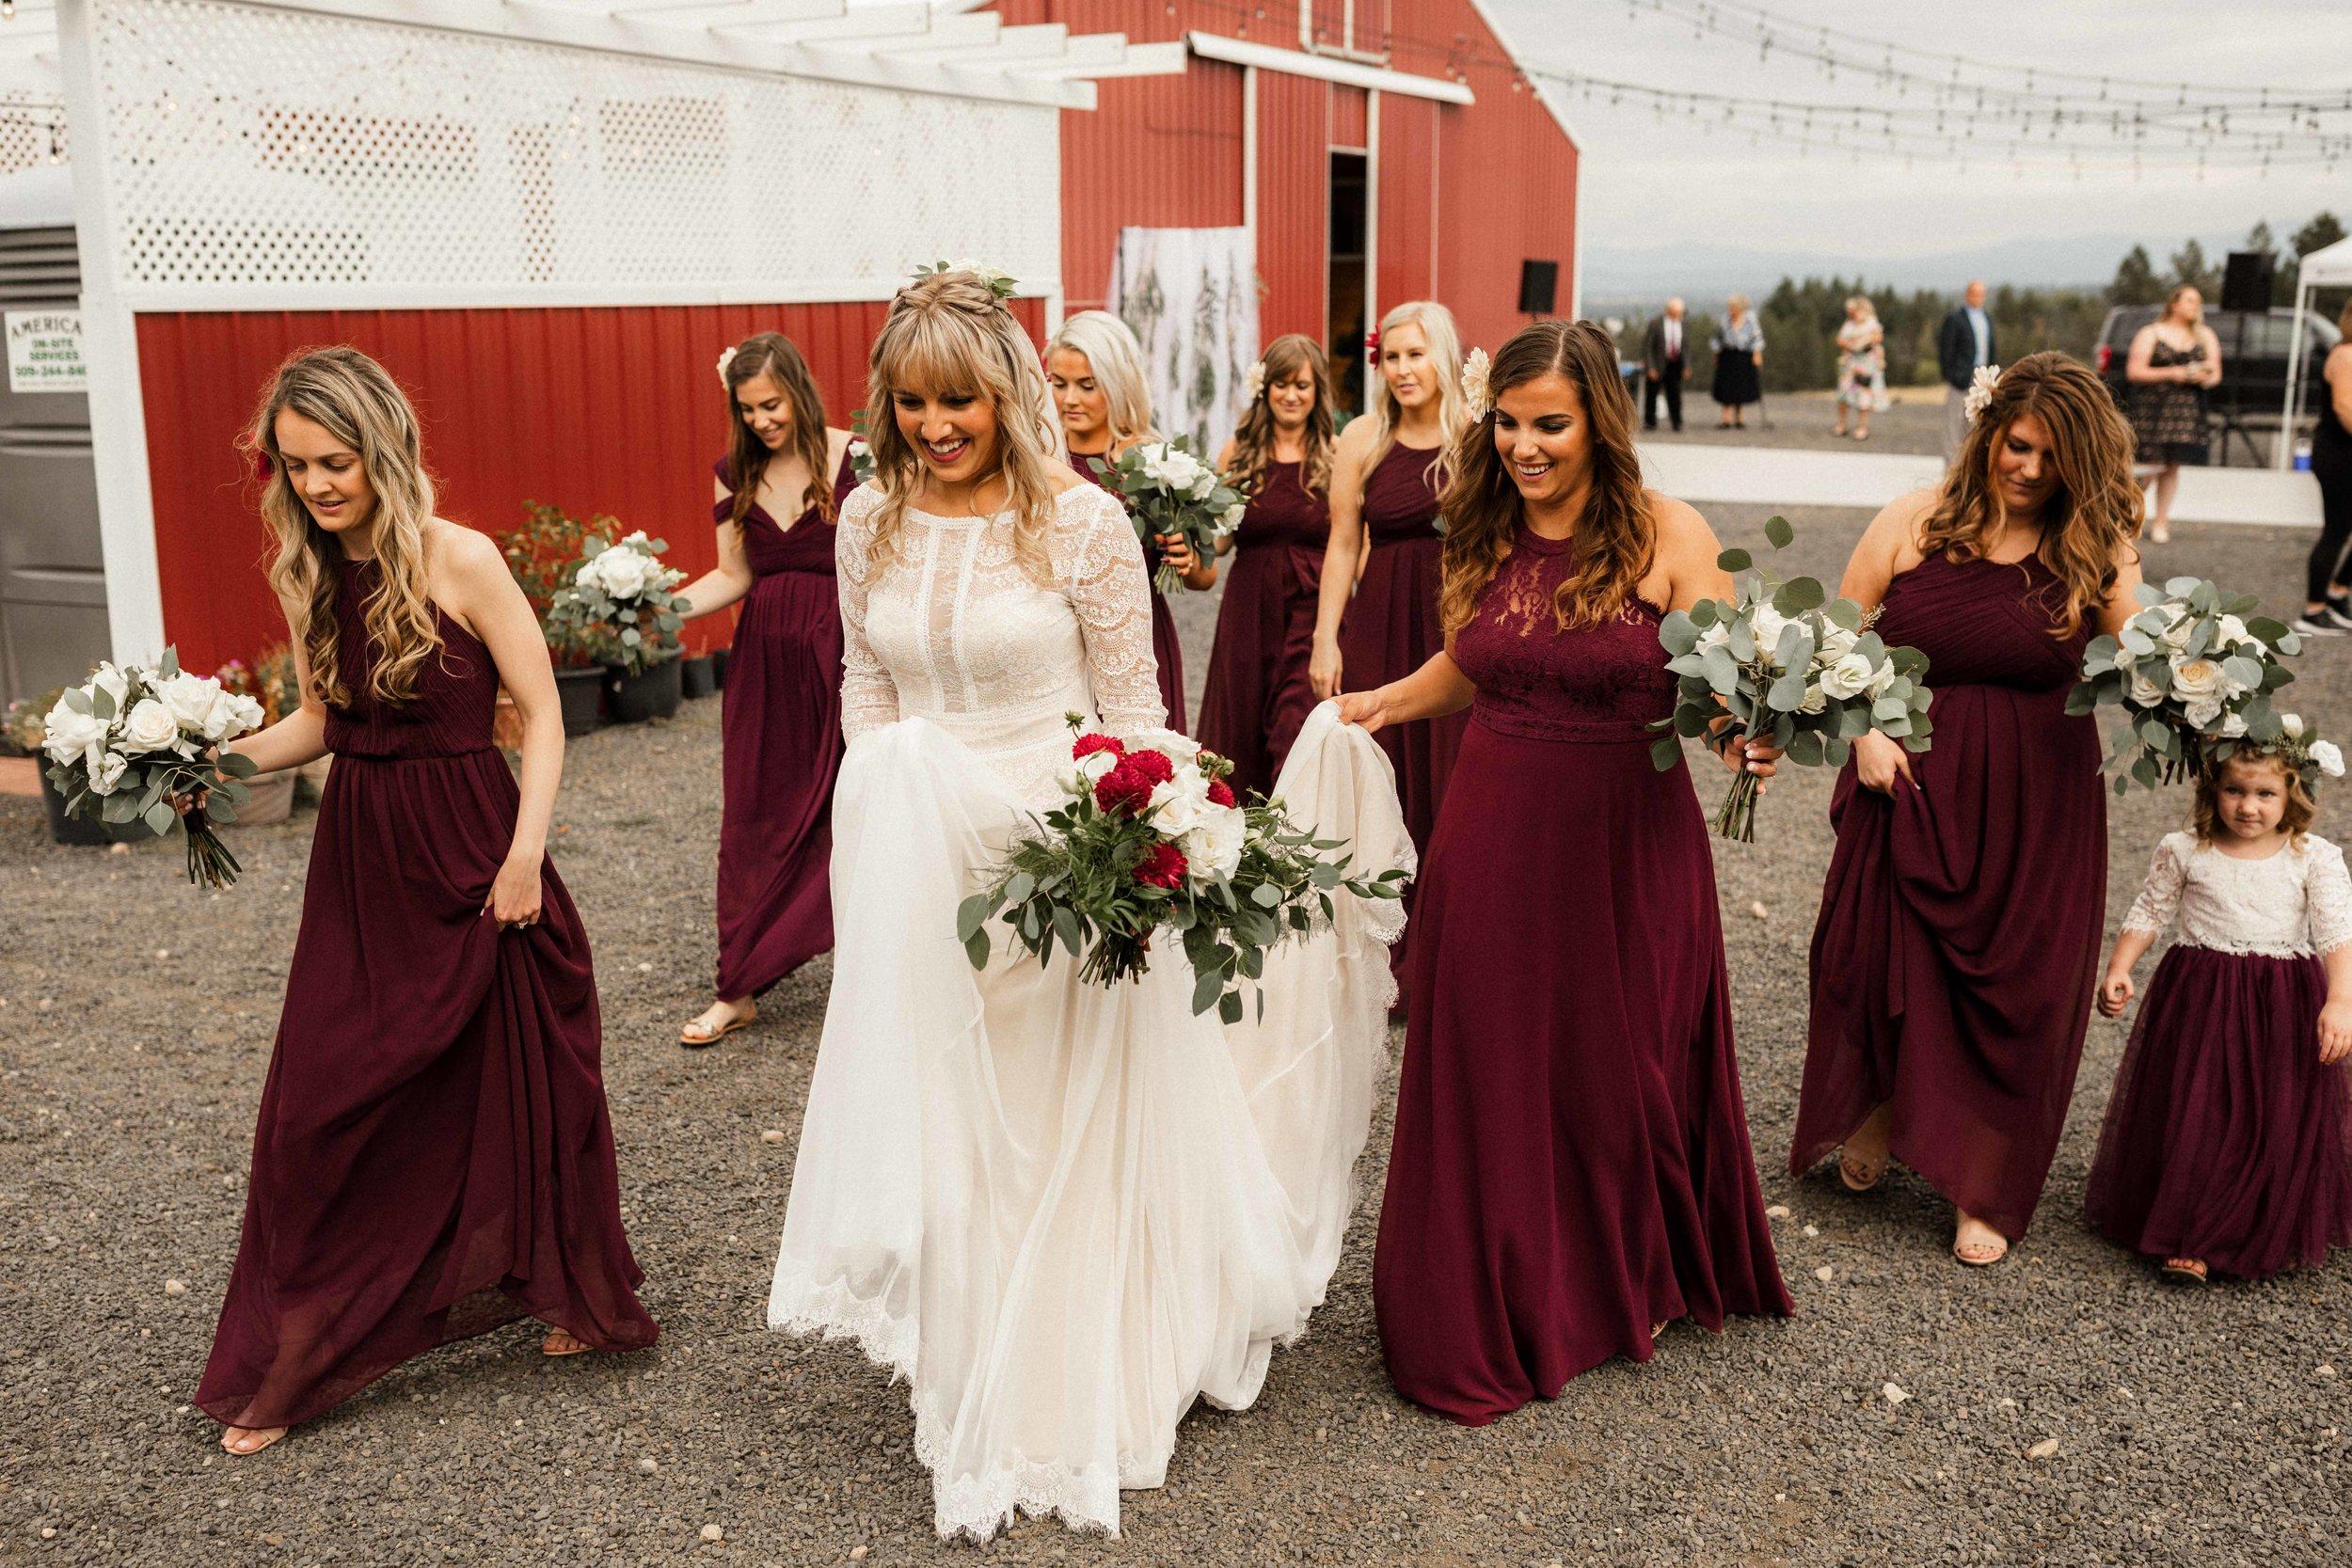 lavender-manor-wedding-36.jpg